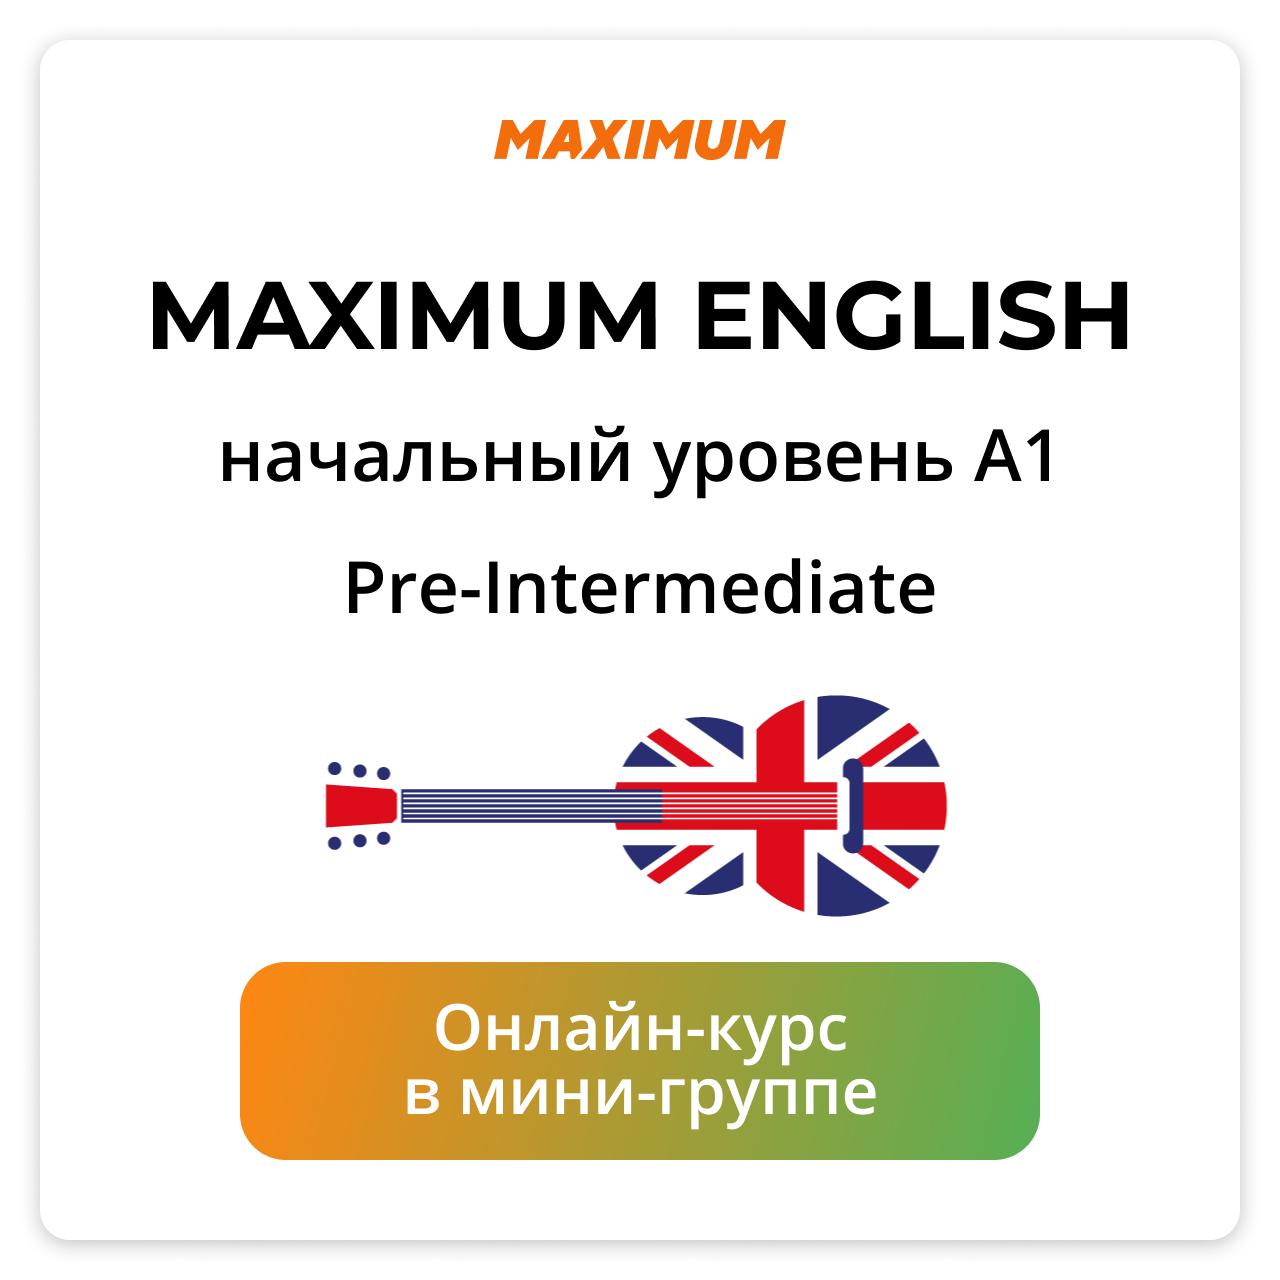 Курсы Английского языка (Pre-Intermediate) A1 Онлайн Мини-группа